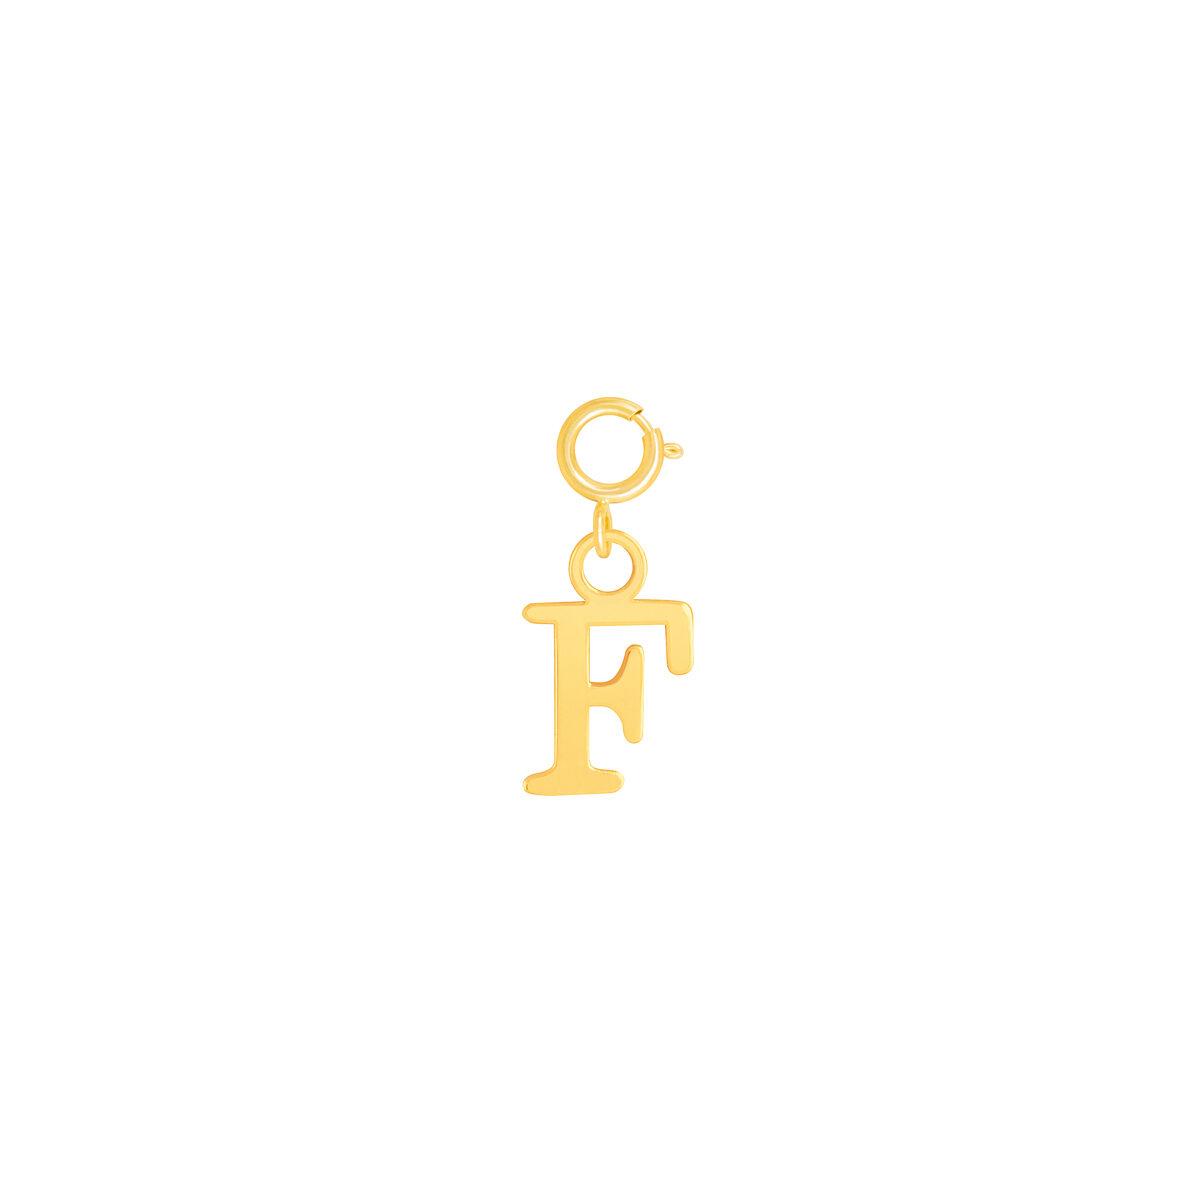 آویز طلا حرف F